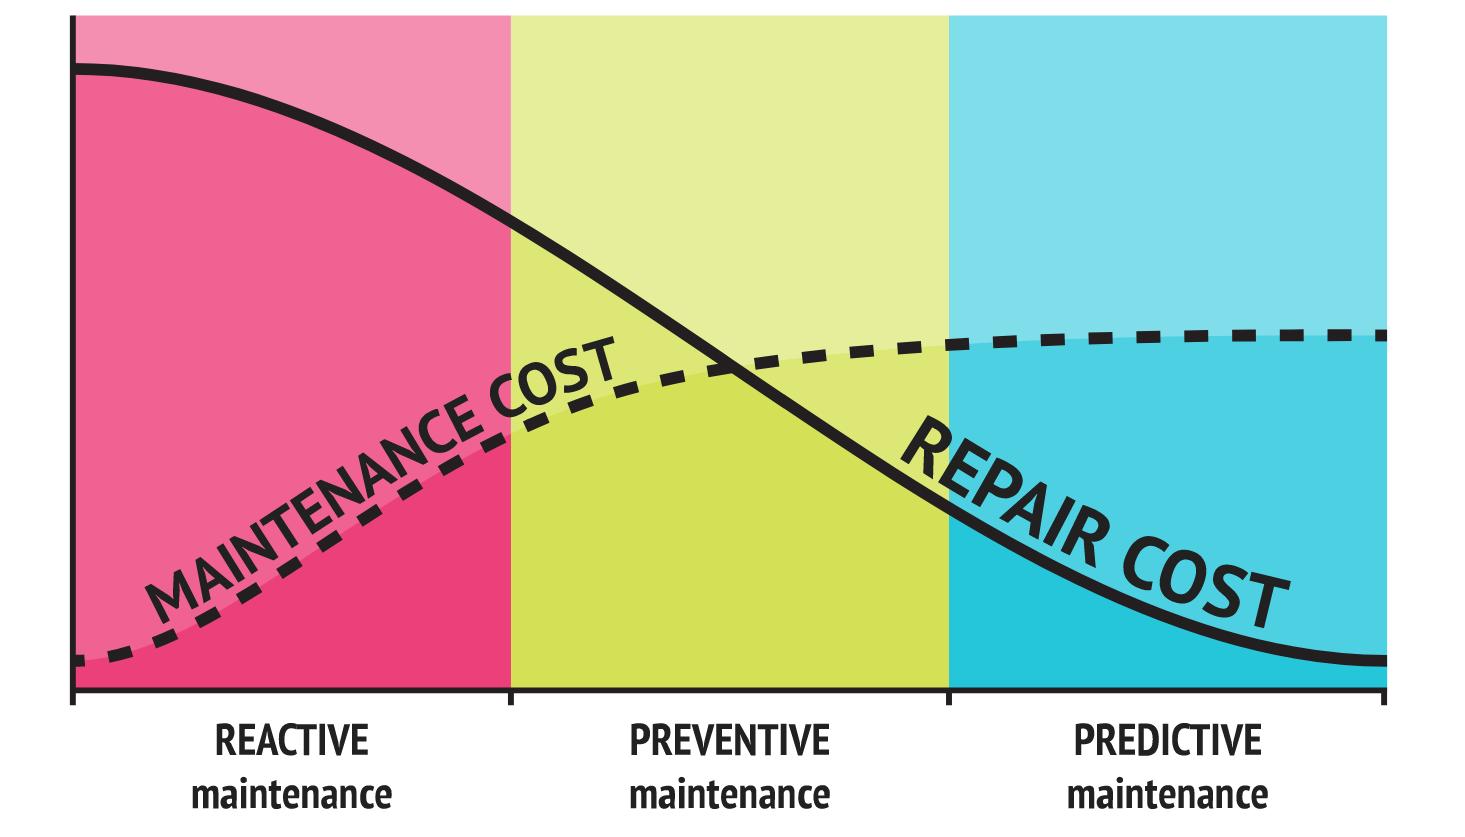 Cost allocation in different maintenance scenarios